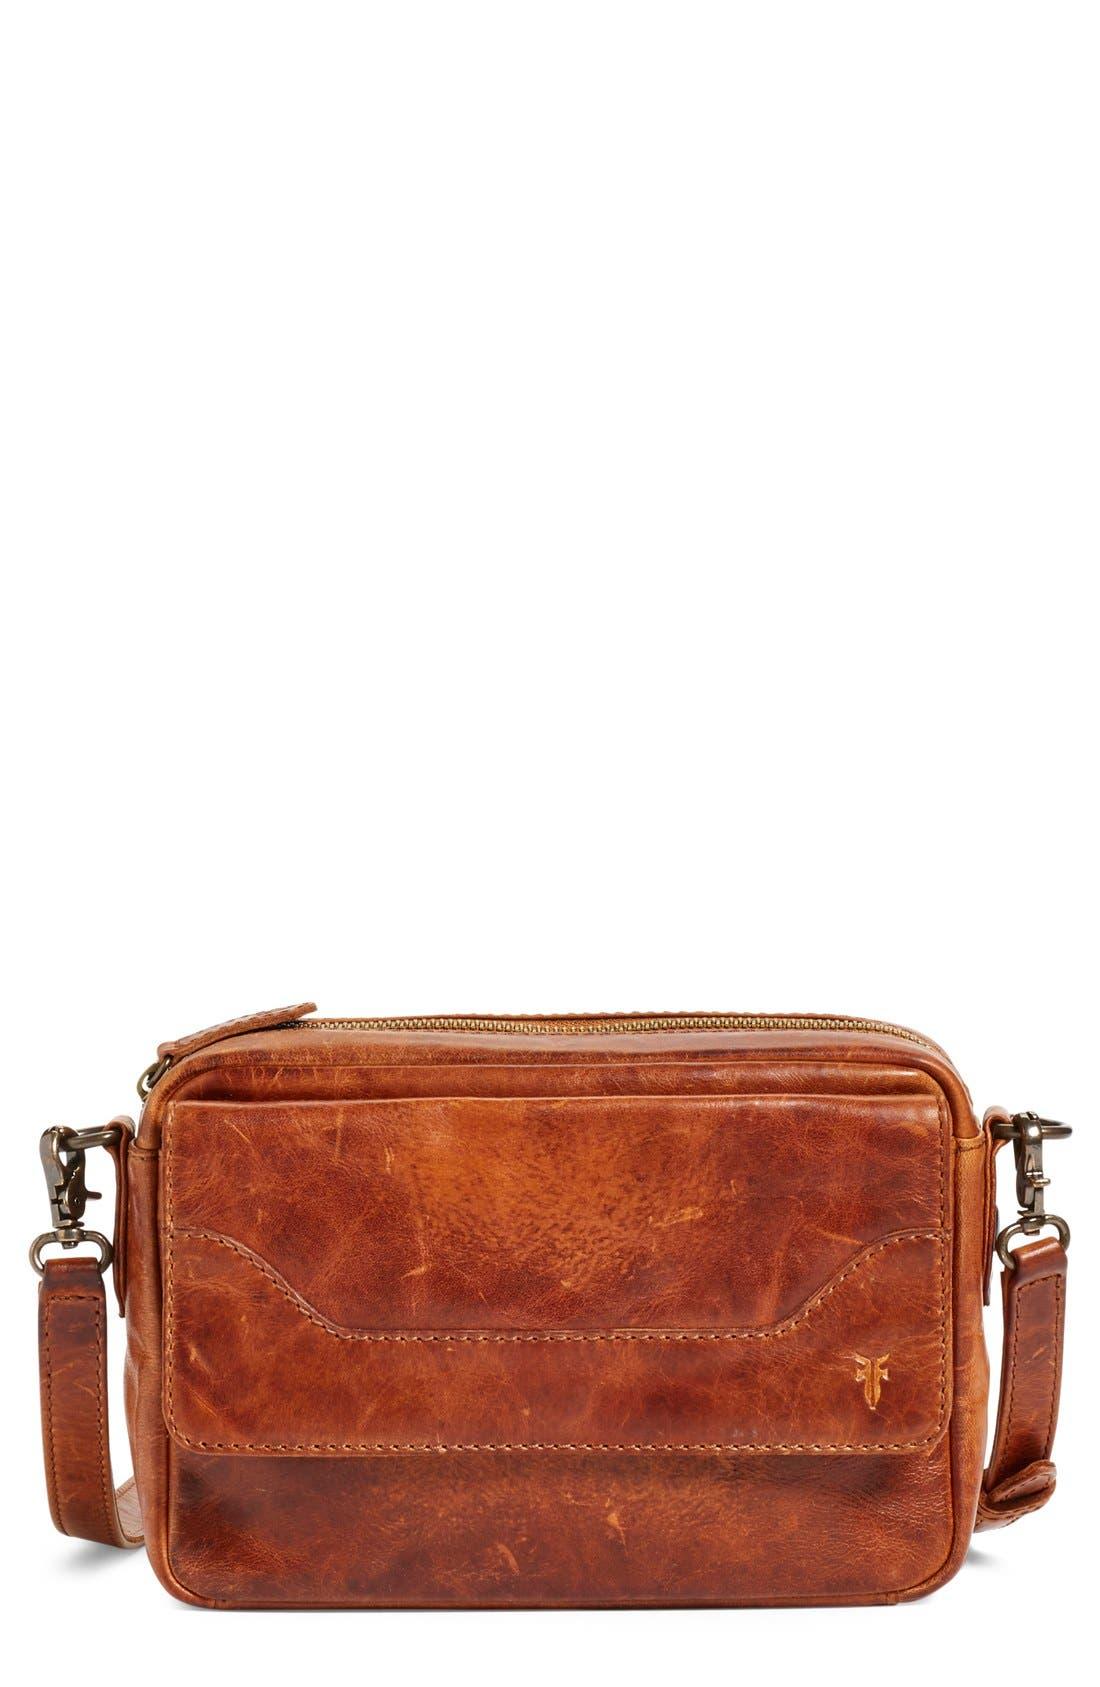 'Melissa' Leather Camera Crossbody Bag, Main, color, 200